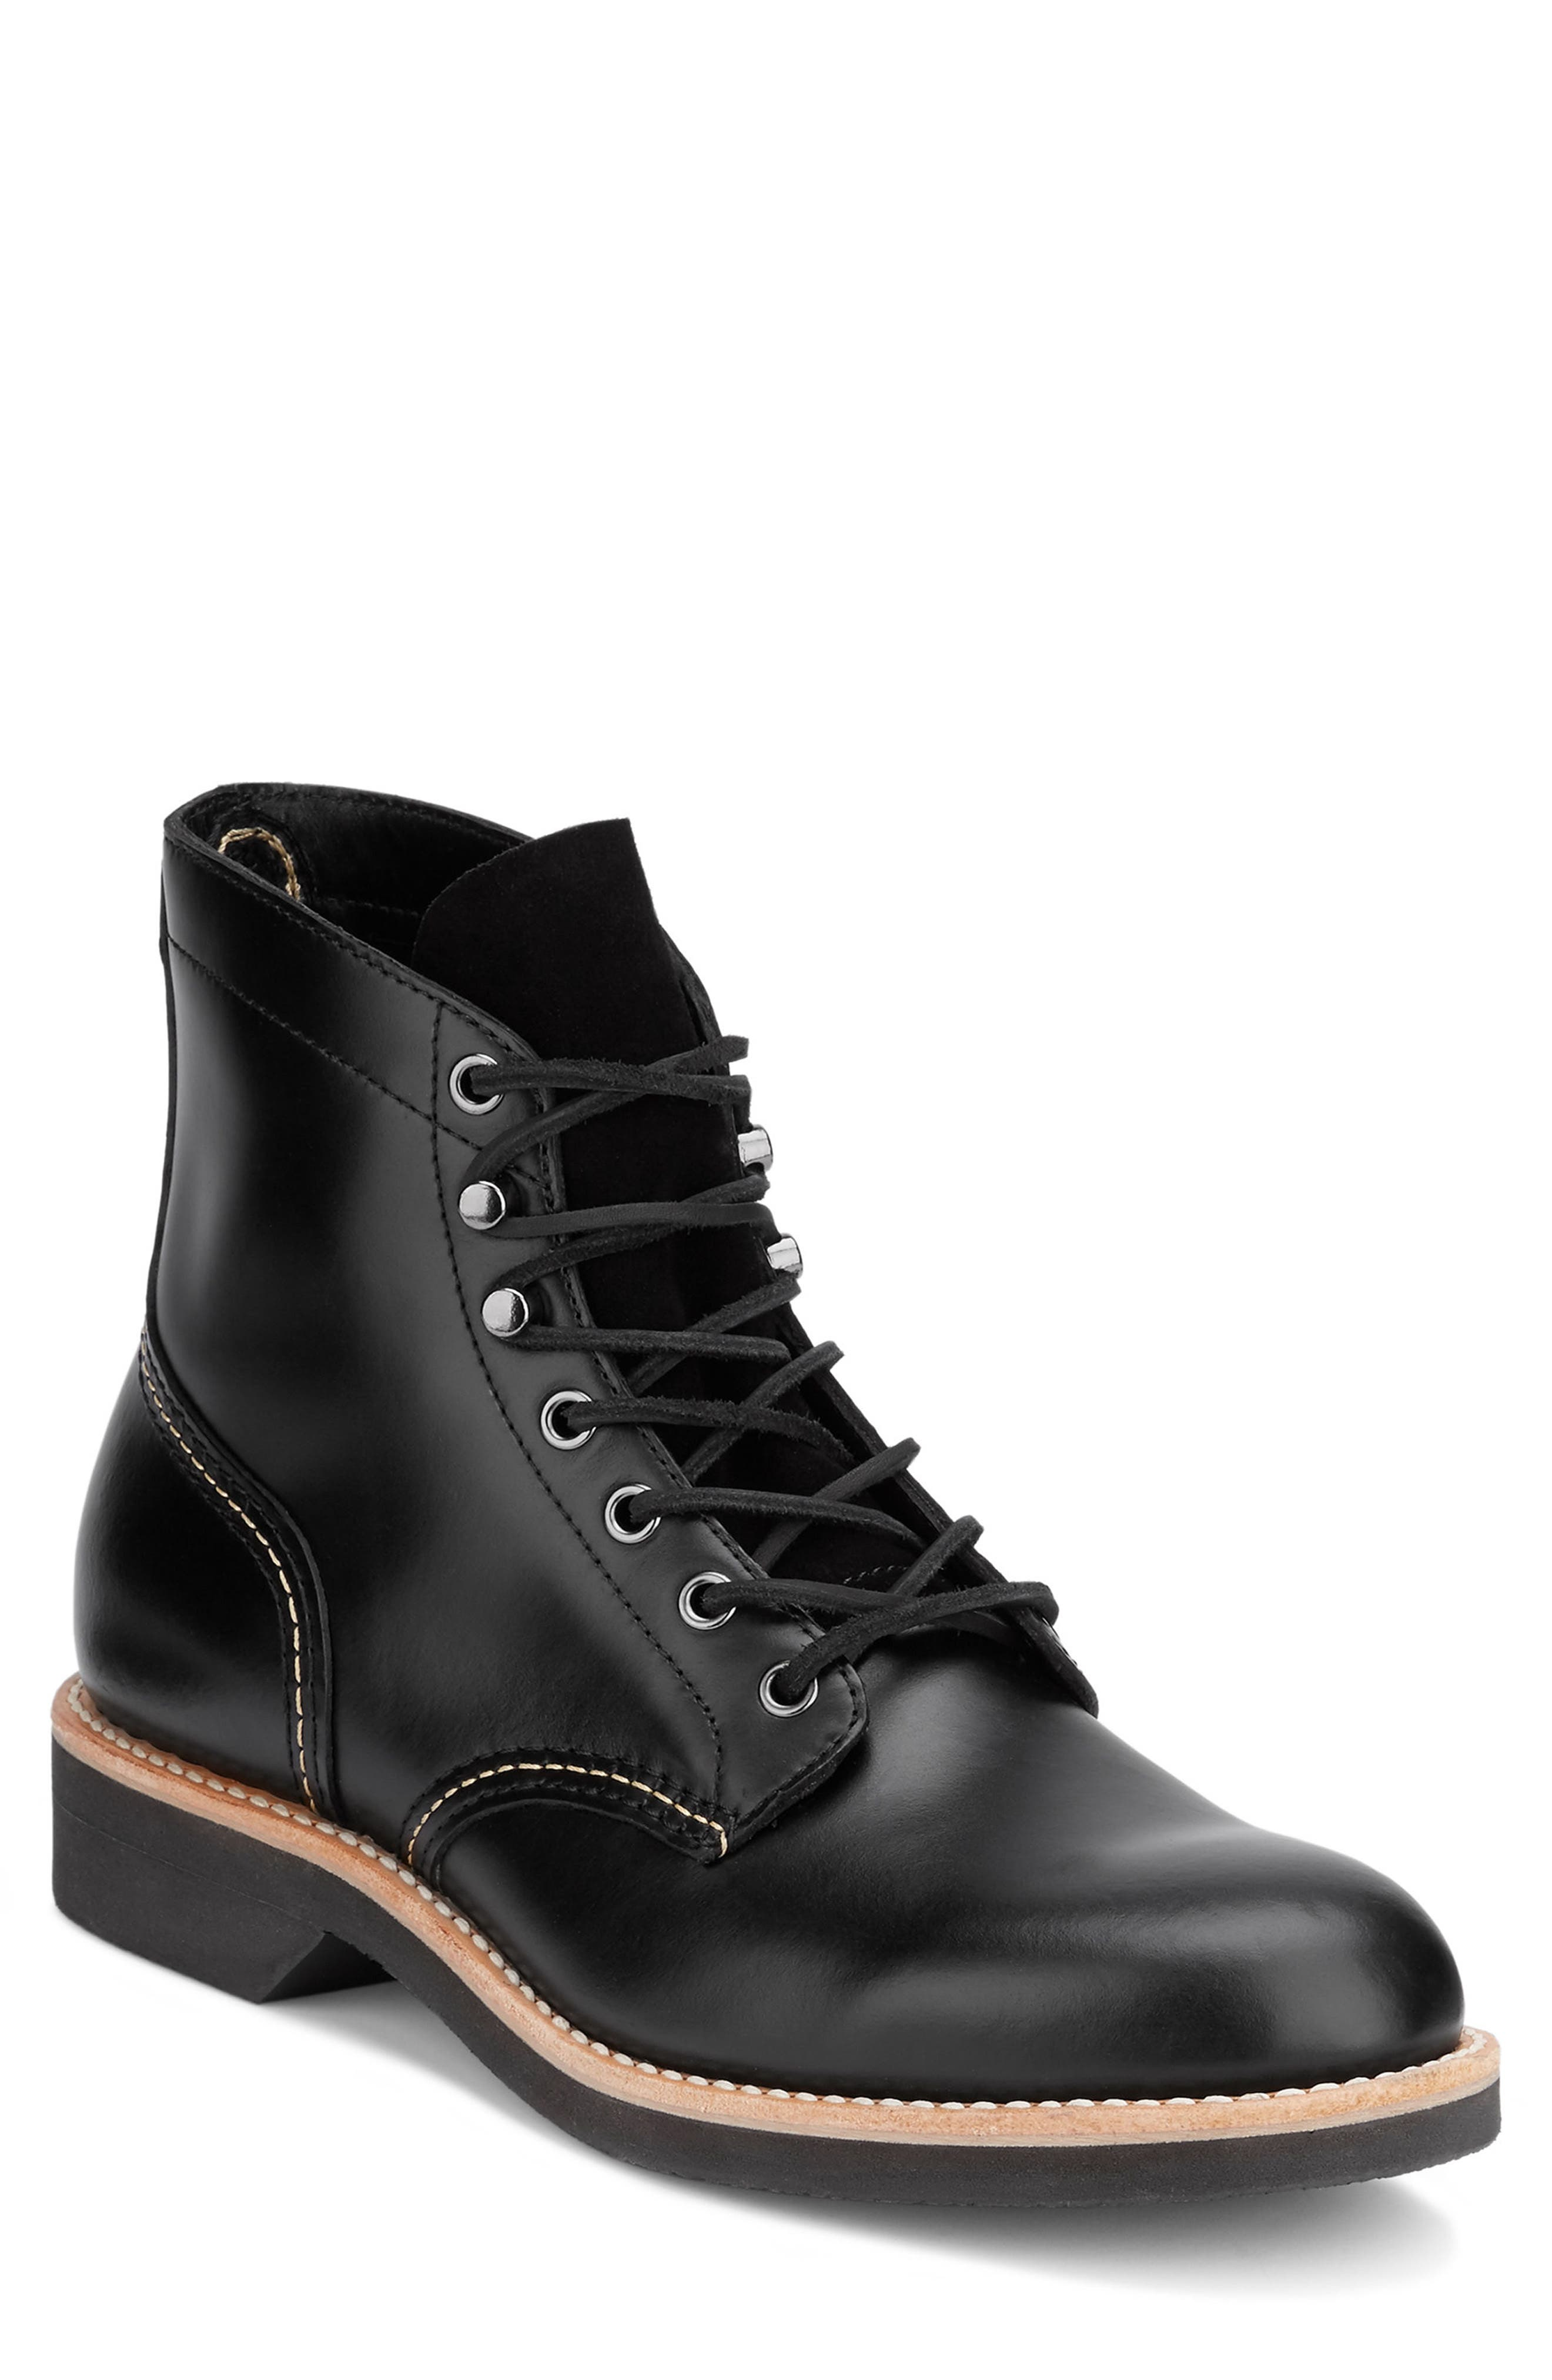 Reid Plain Toe Boot,                         Main,                         color, Black